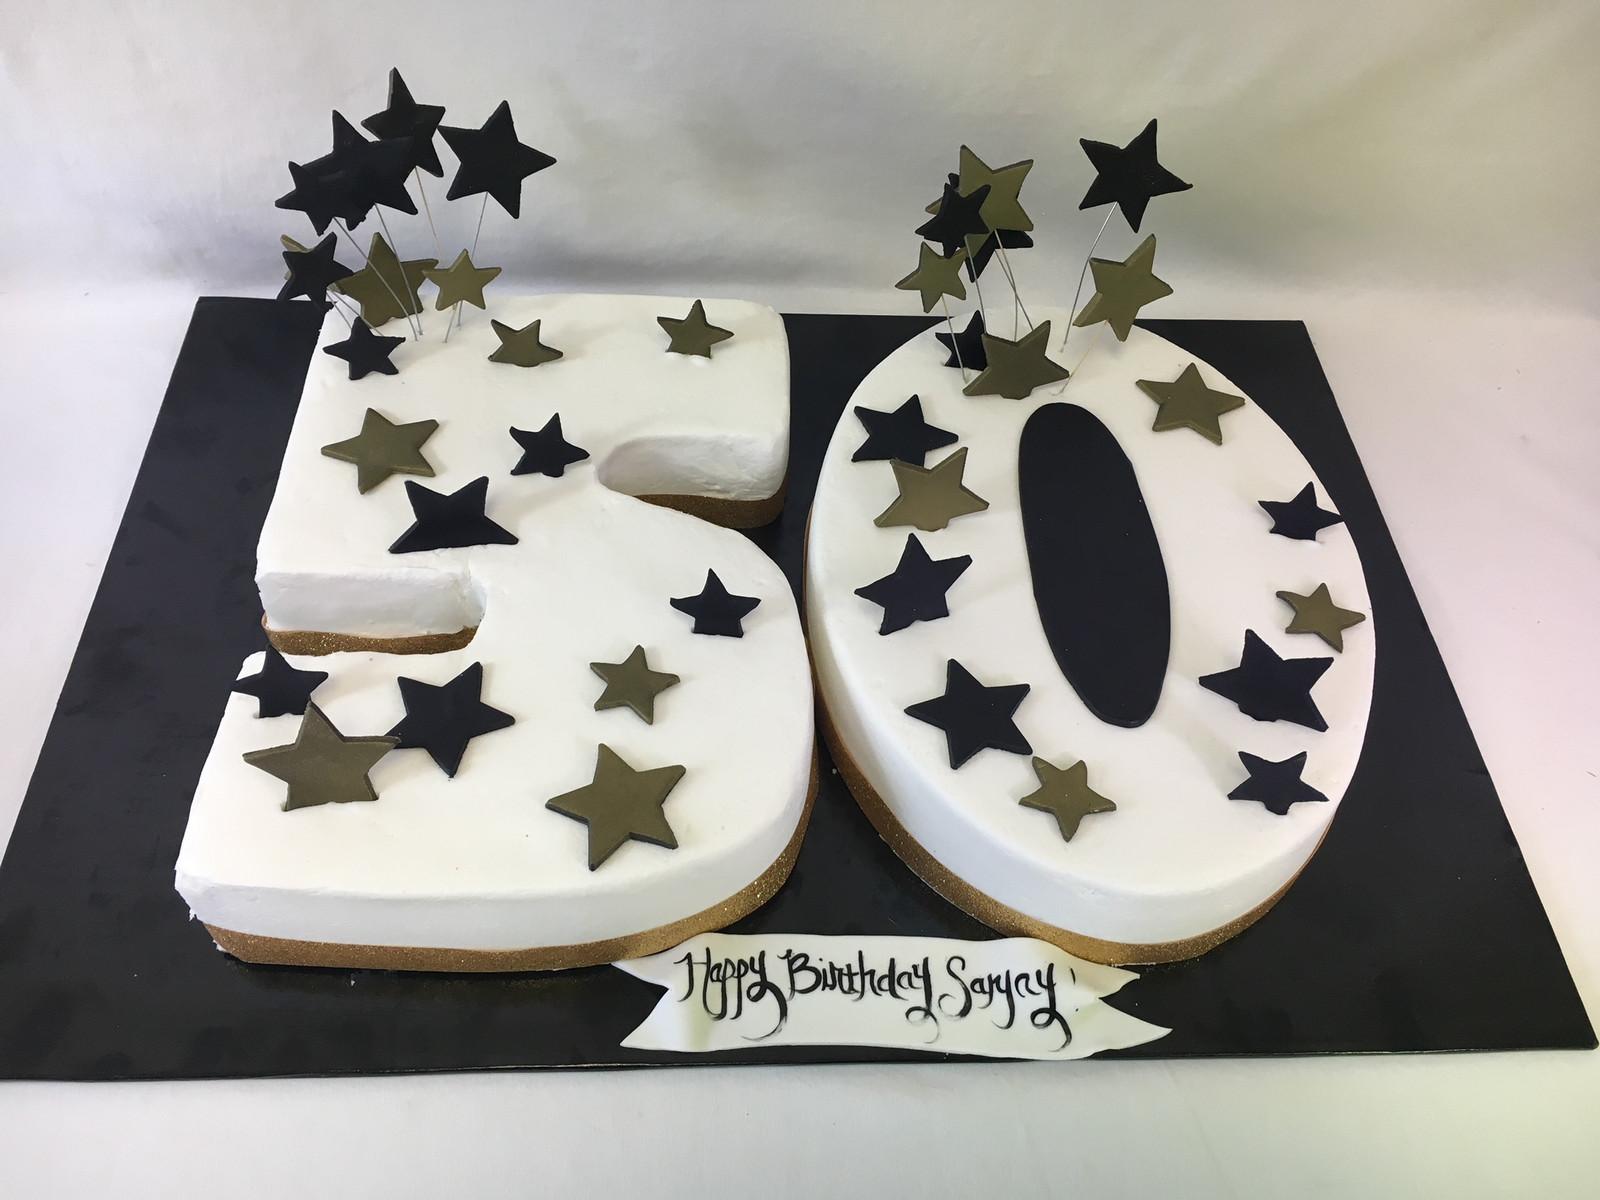 Birthday Cake MB 103